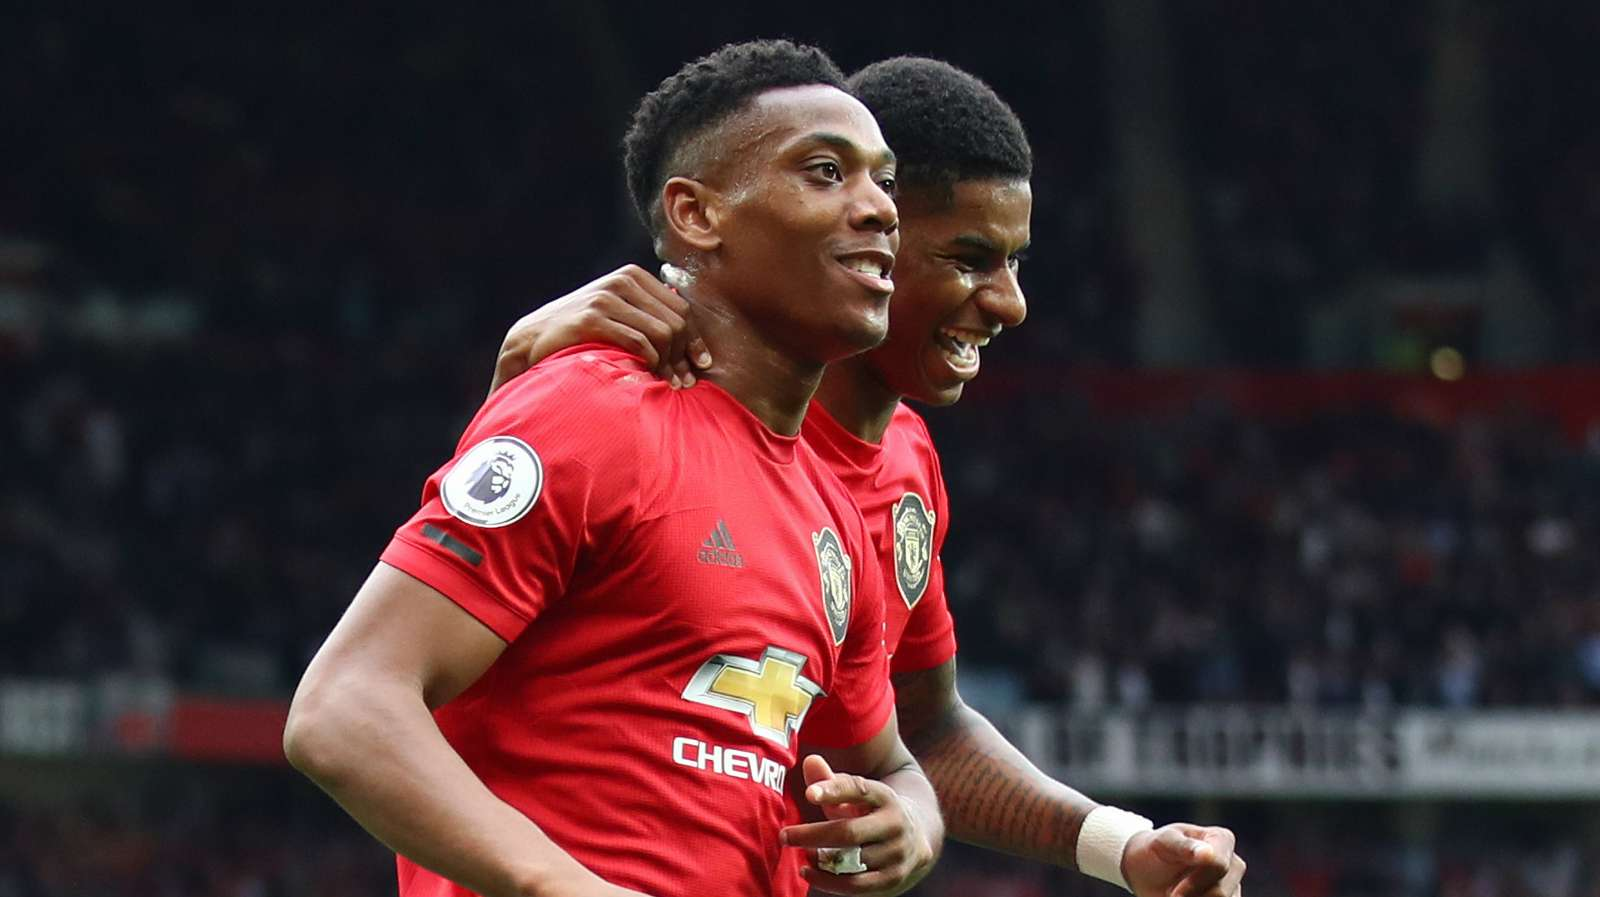 Rashford & Martial must emulate Sterling goal haul to deliver Man Utd success, says Collymore - Bóng Đá